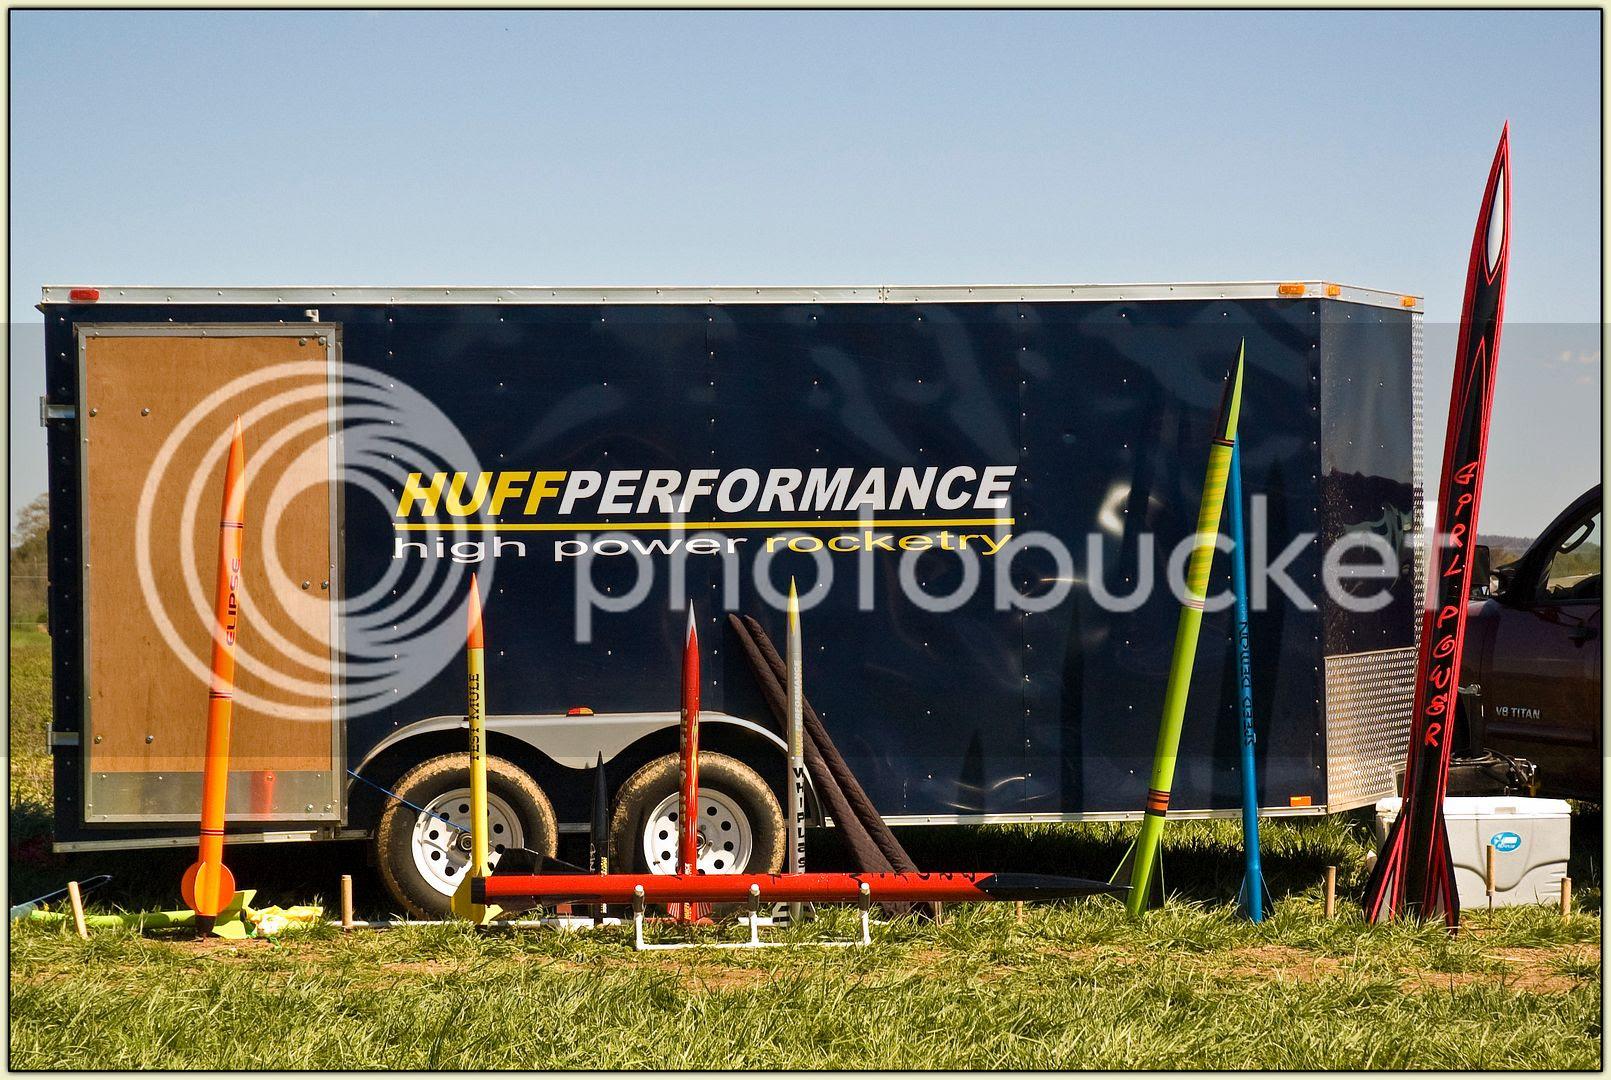 Huff Performance